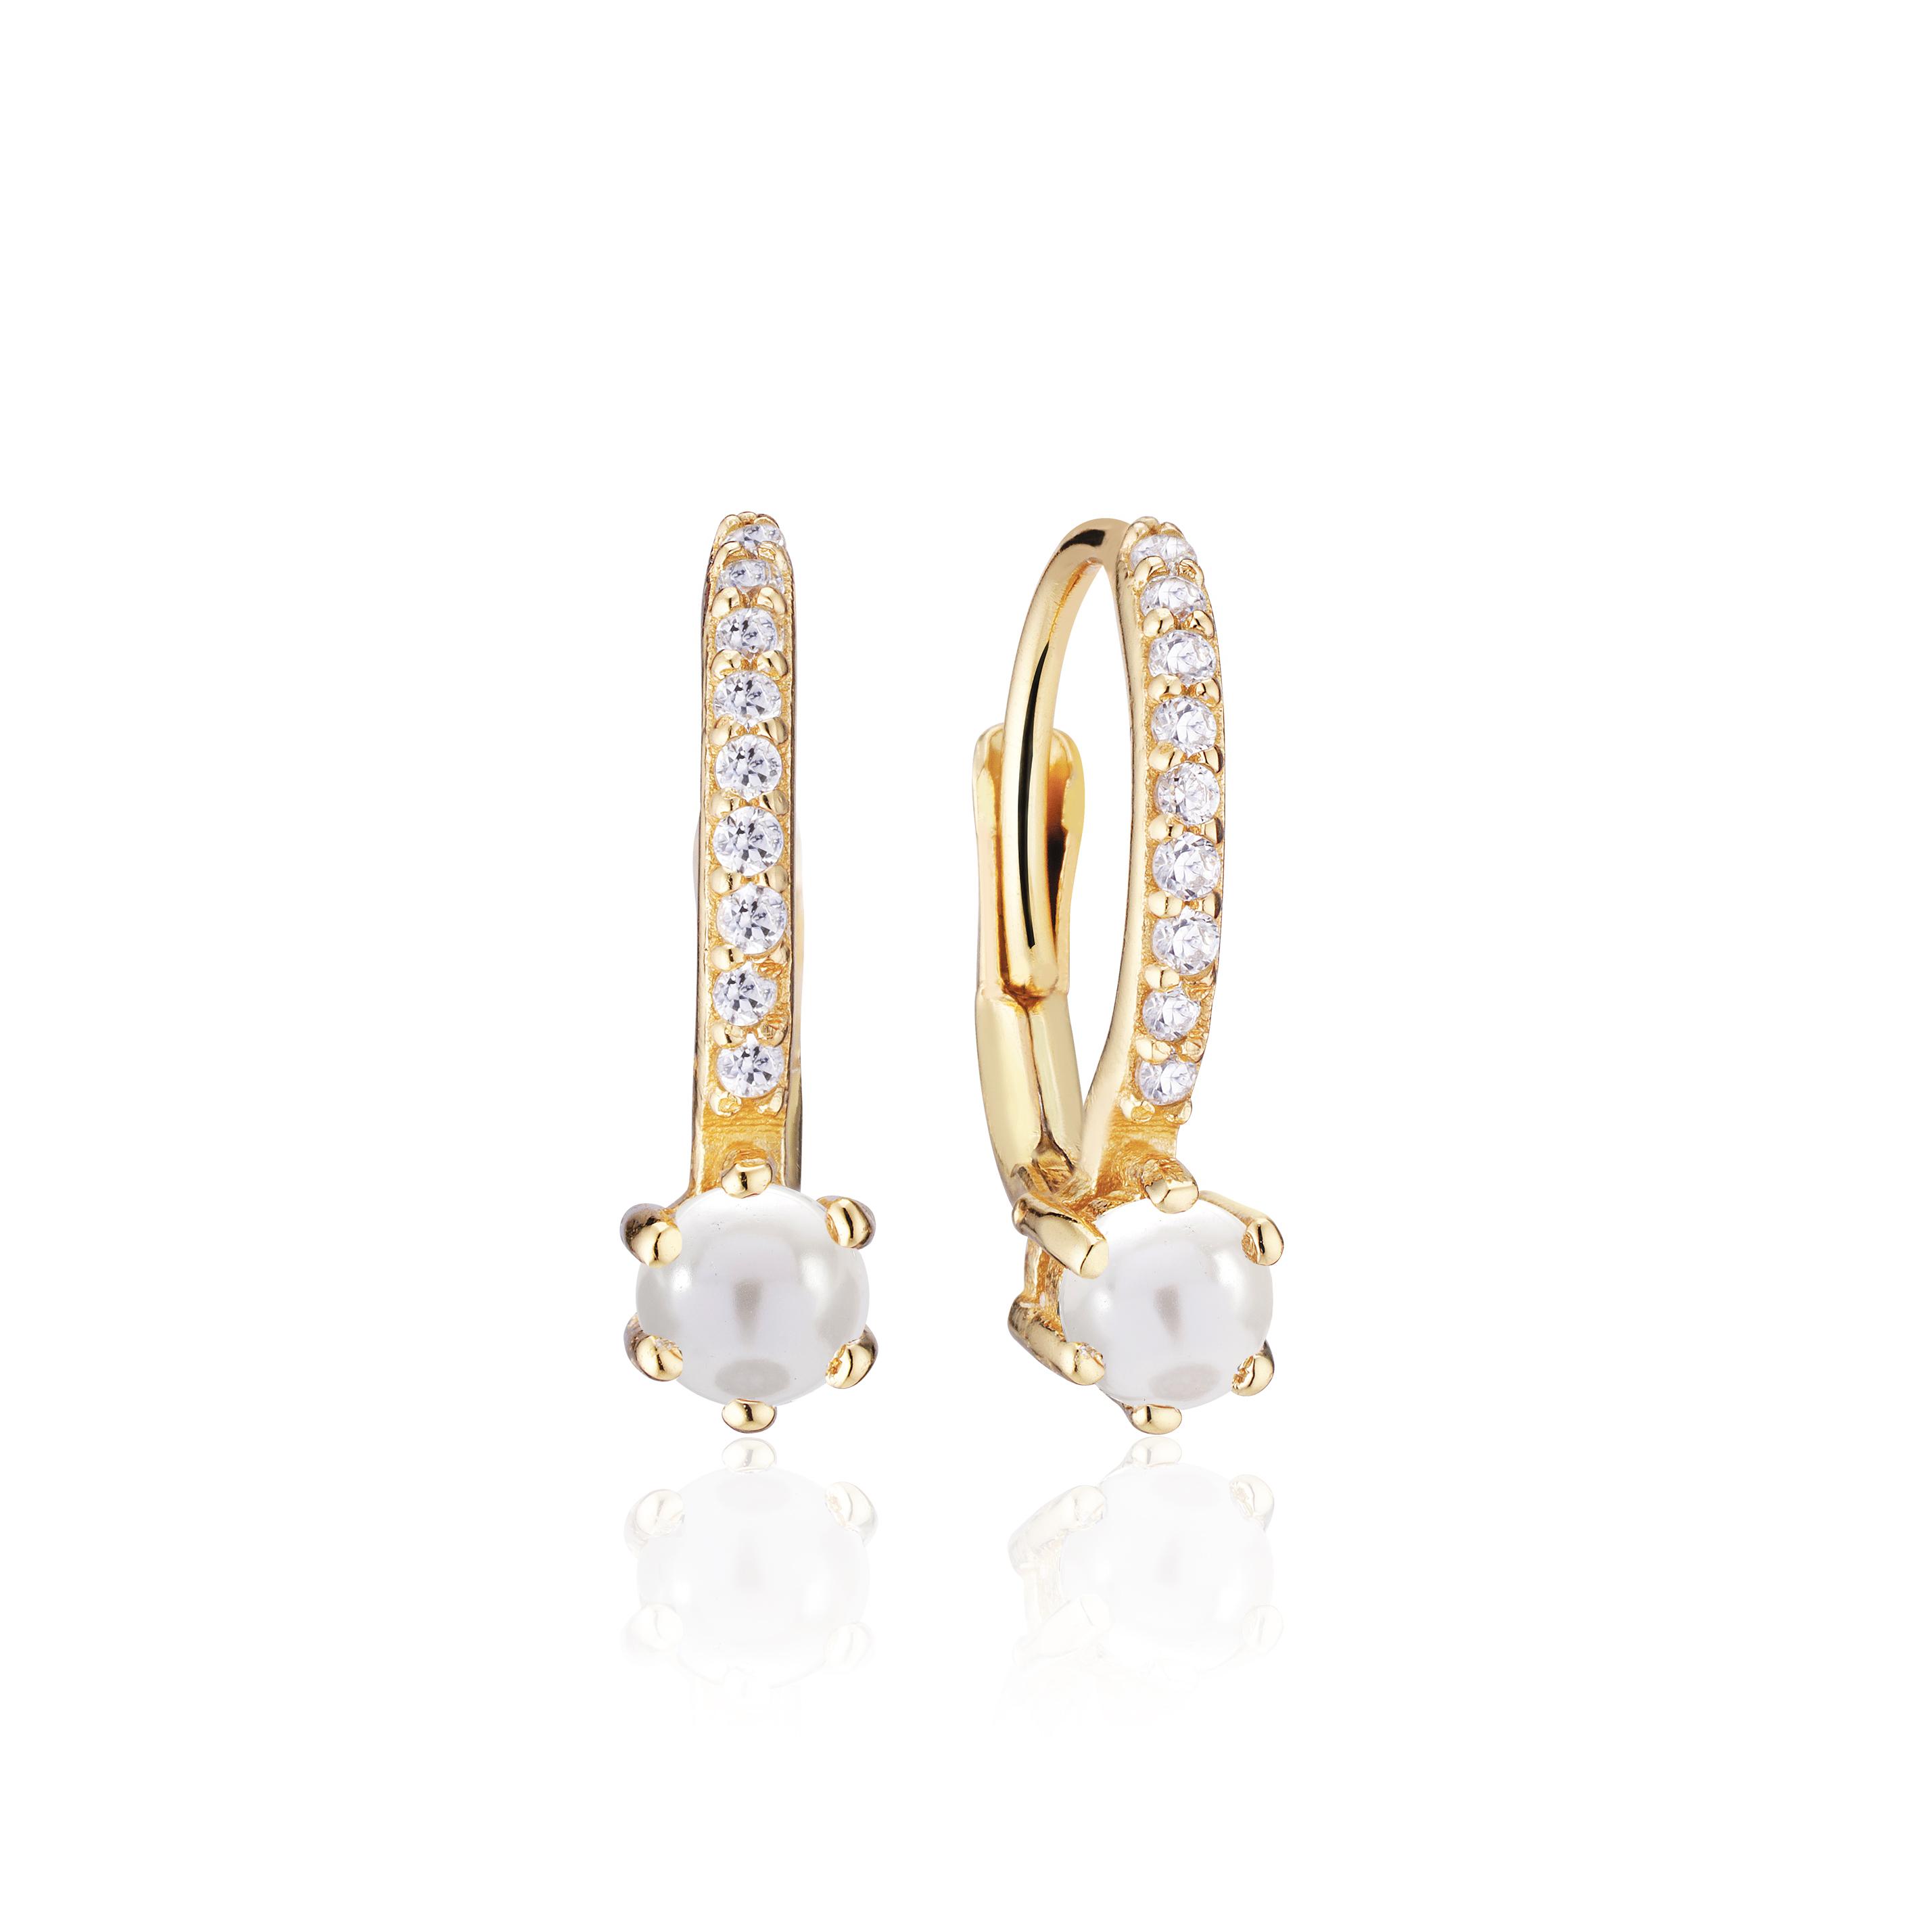 Sif Jakobs Jewellery Rimini Pearl Altro øreringe